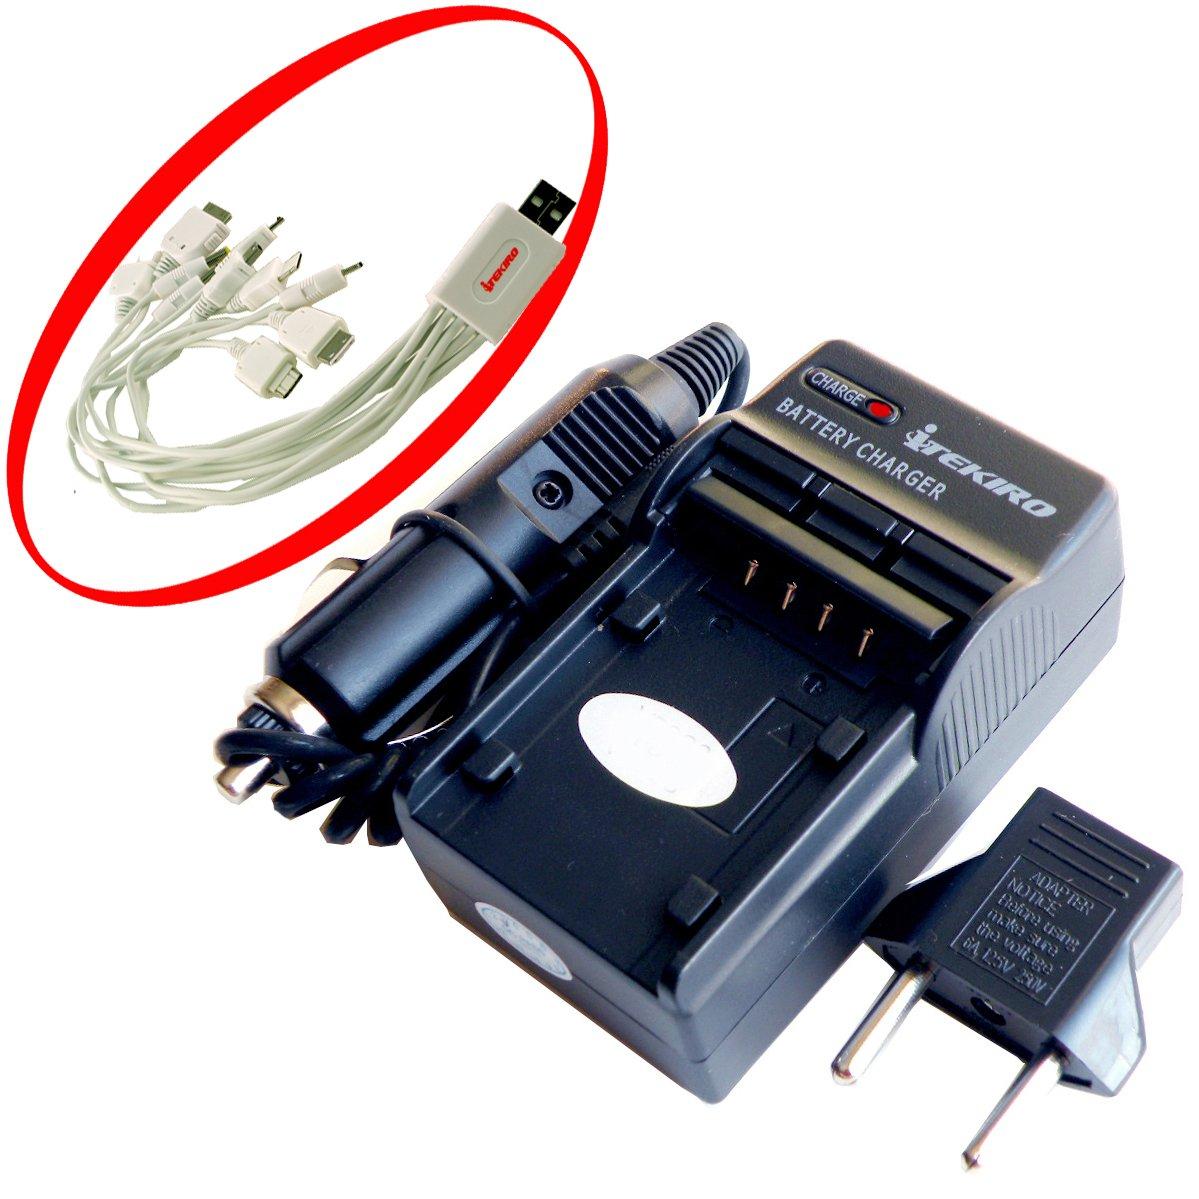 iTEKIRO AC壁DCカーバッテリー充電器キットfor Polaroid ds5370 + iTEKIRO 10-in-1 USB充電ケーブル   B003H3EZN0